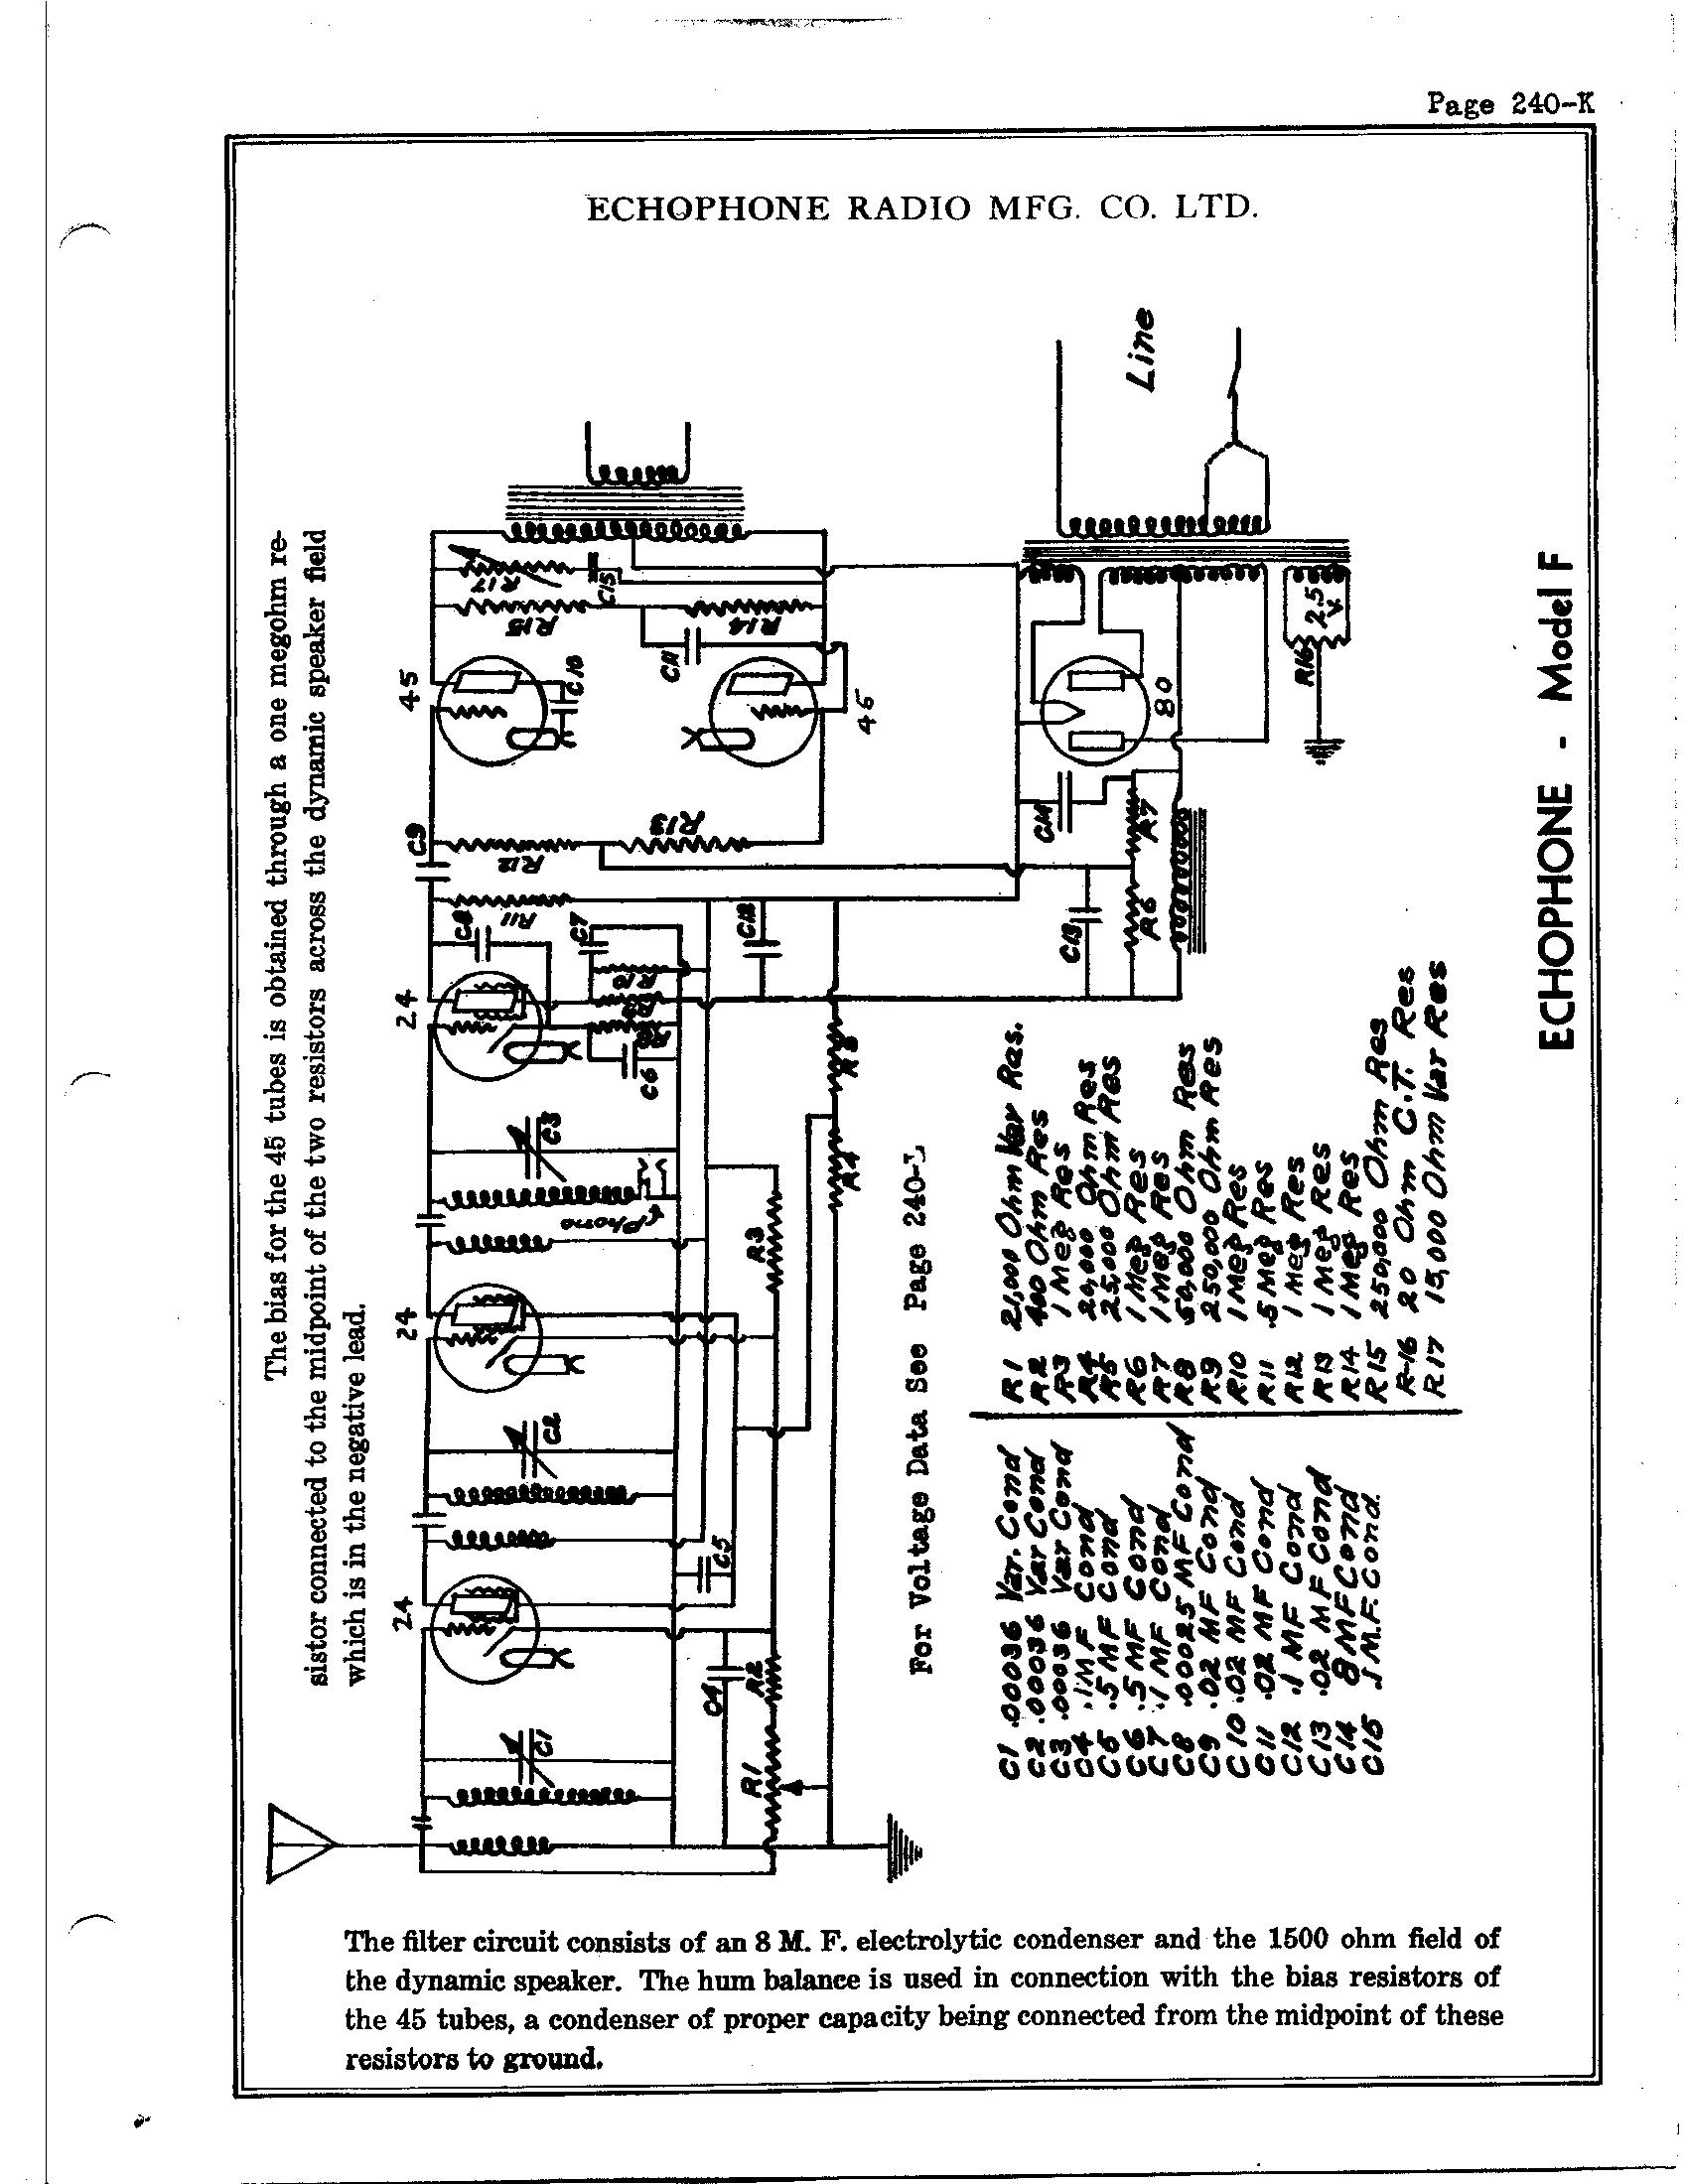 Echophone Radio Corp. F   Antique Electronic Supply on